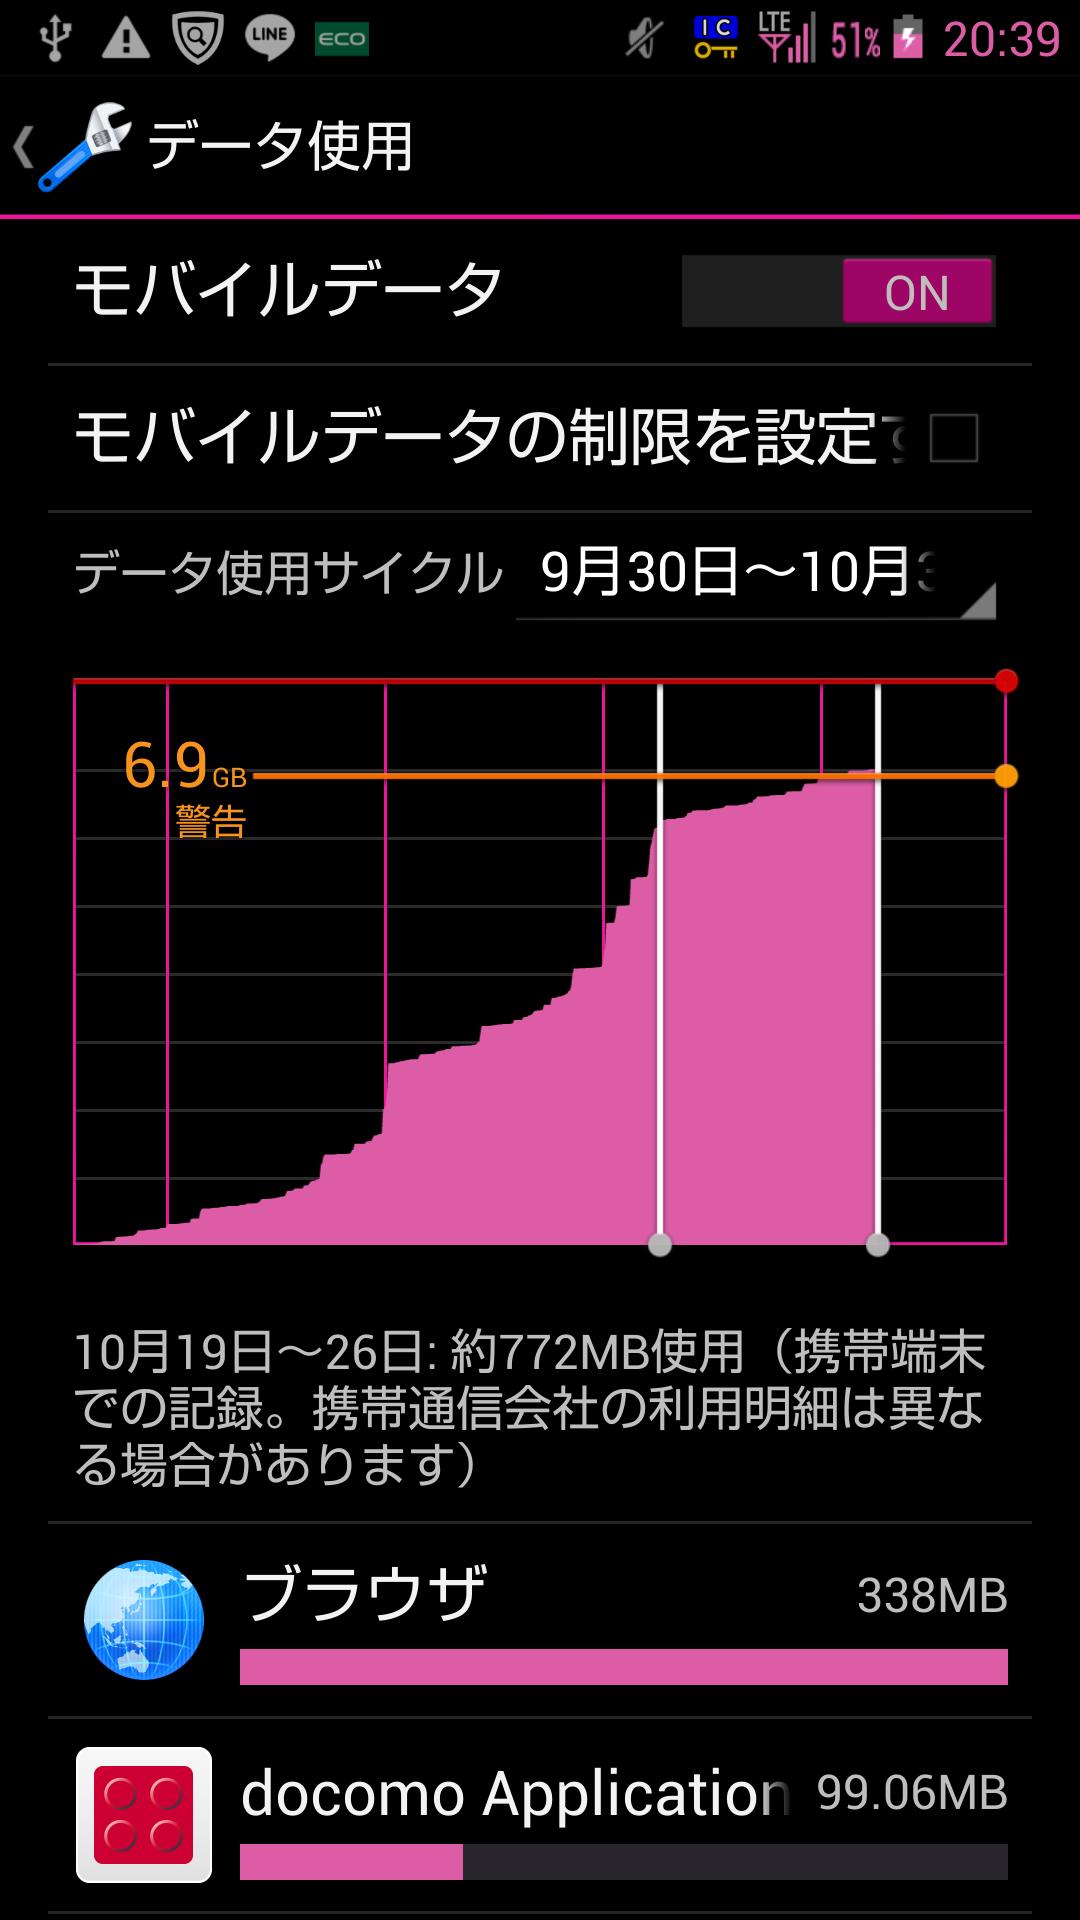 Screenshot_2015-10-26-20-39-47